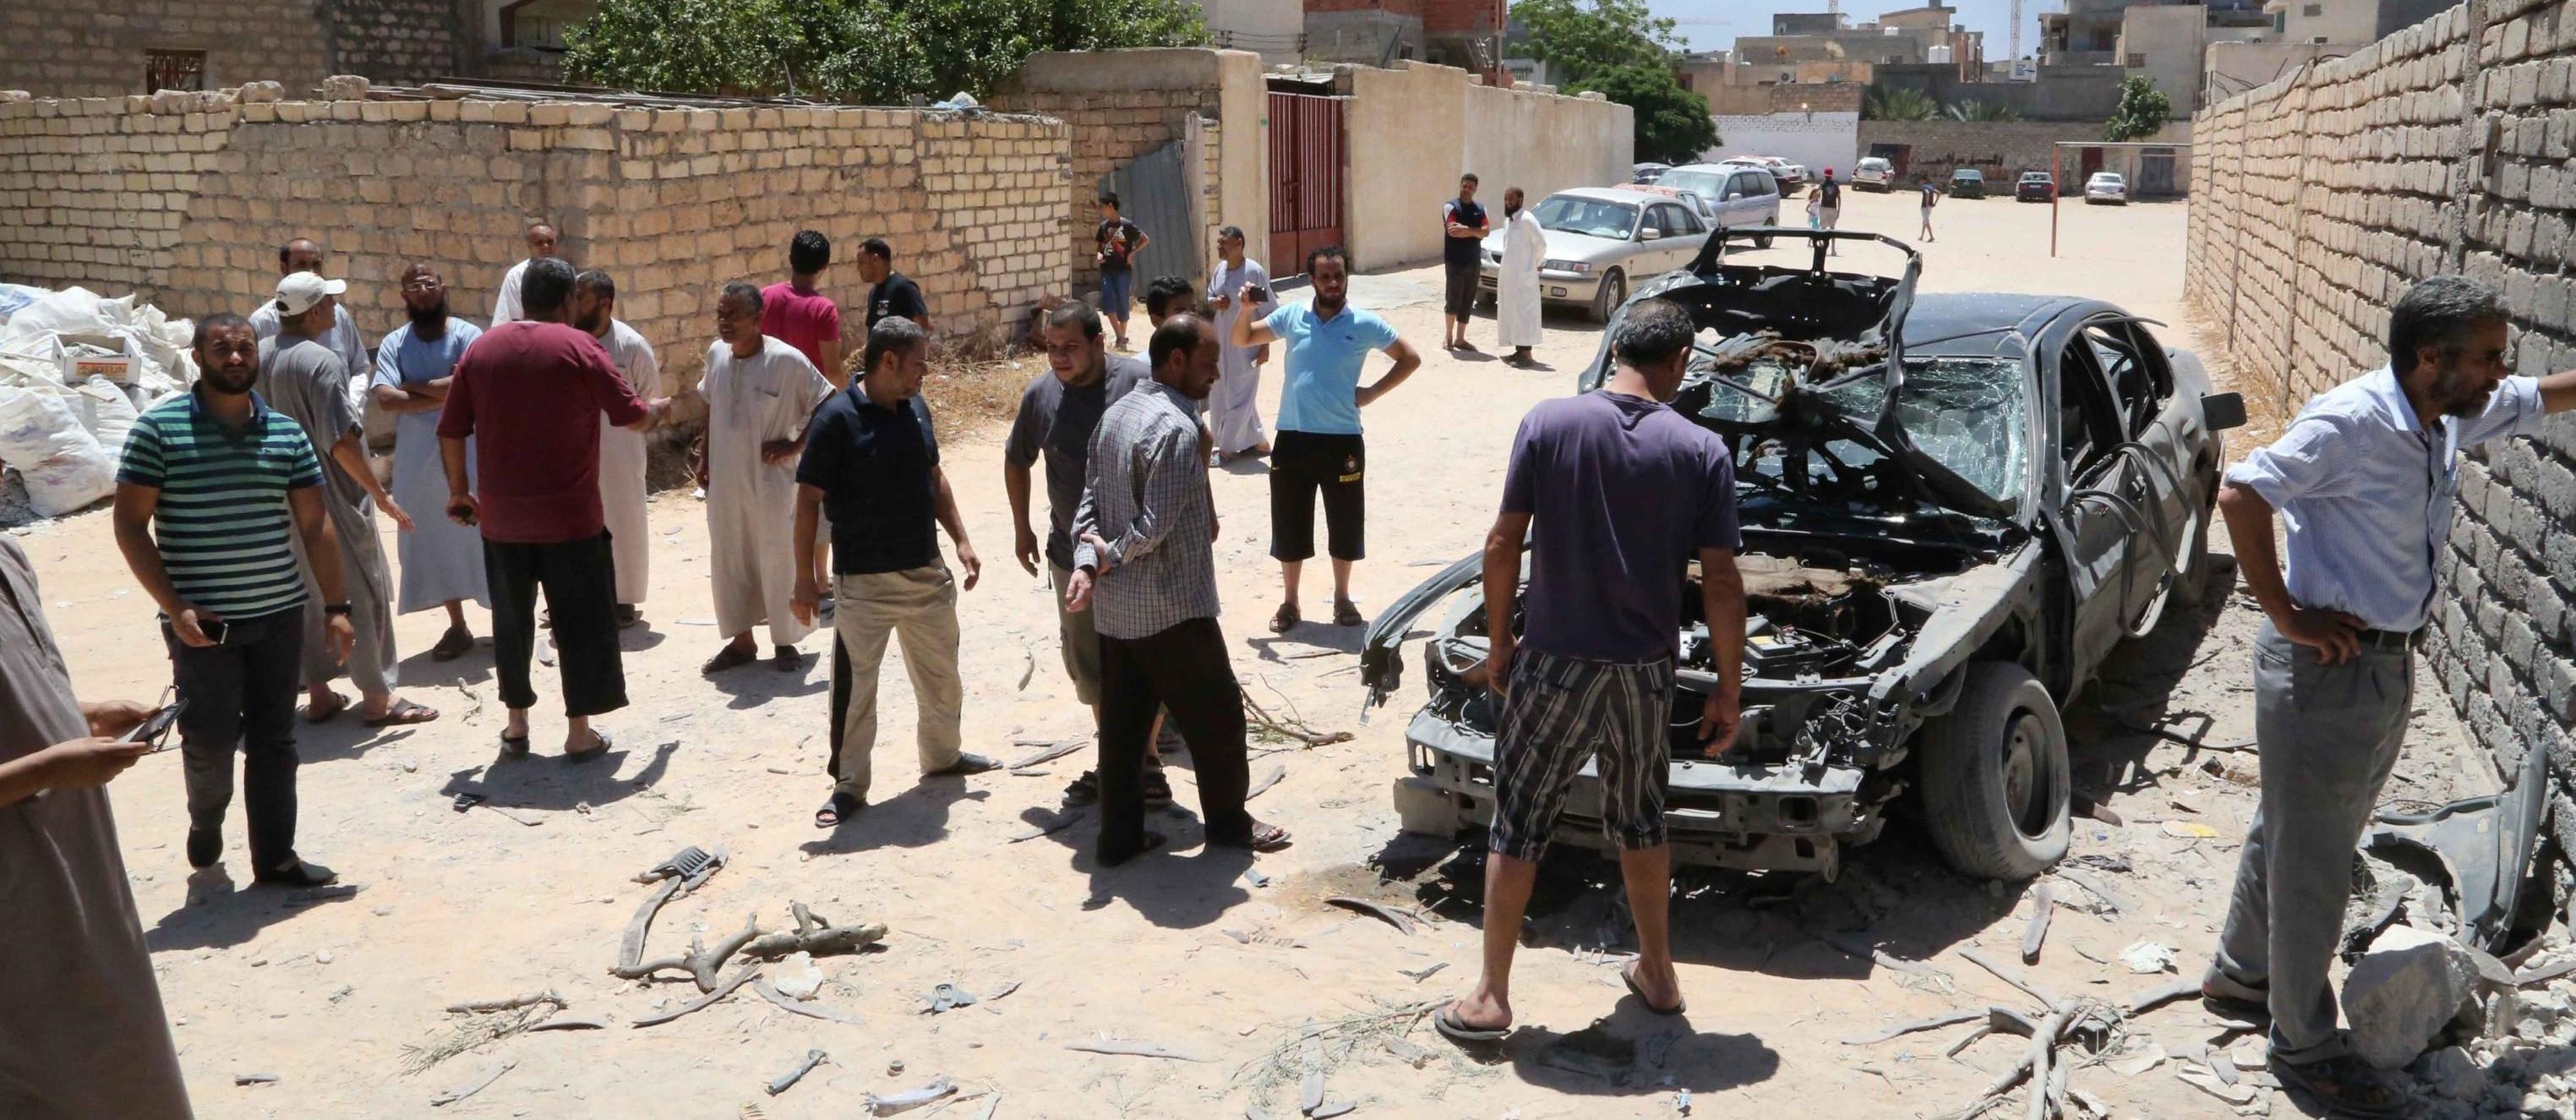 Bomba a Bengasi